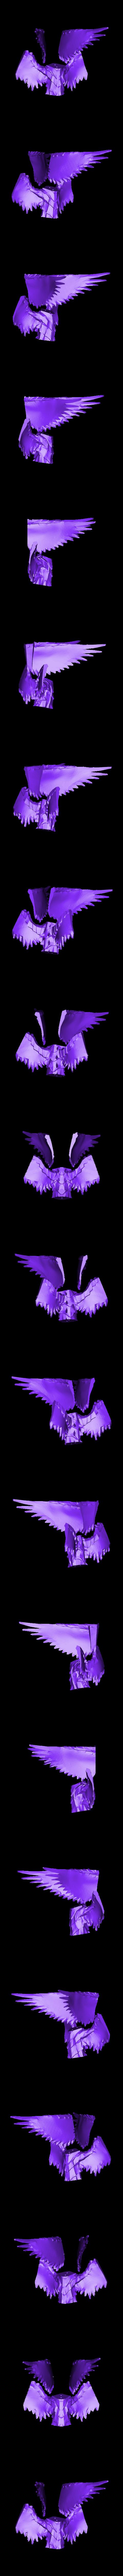 Kukulkan_Wings_1_Alt.stl Download free STL file SMITE Kukulkan Statue • 3D printable object, Solid_Alexei